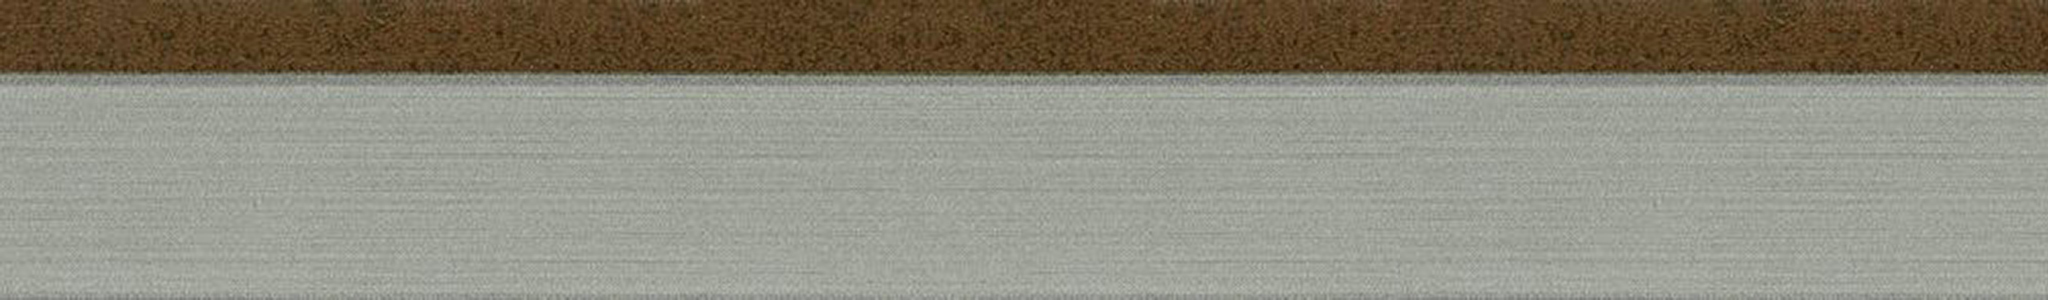 HD 29746 Acryl 3D Kante Edelstahl-Cuzco